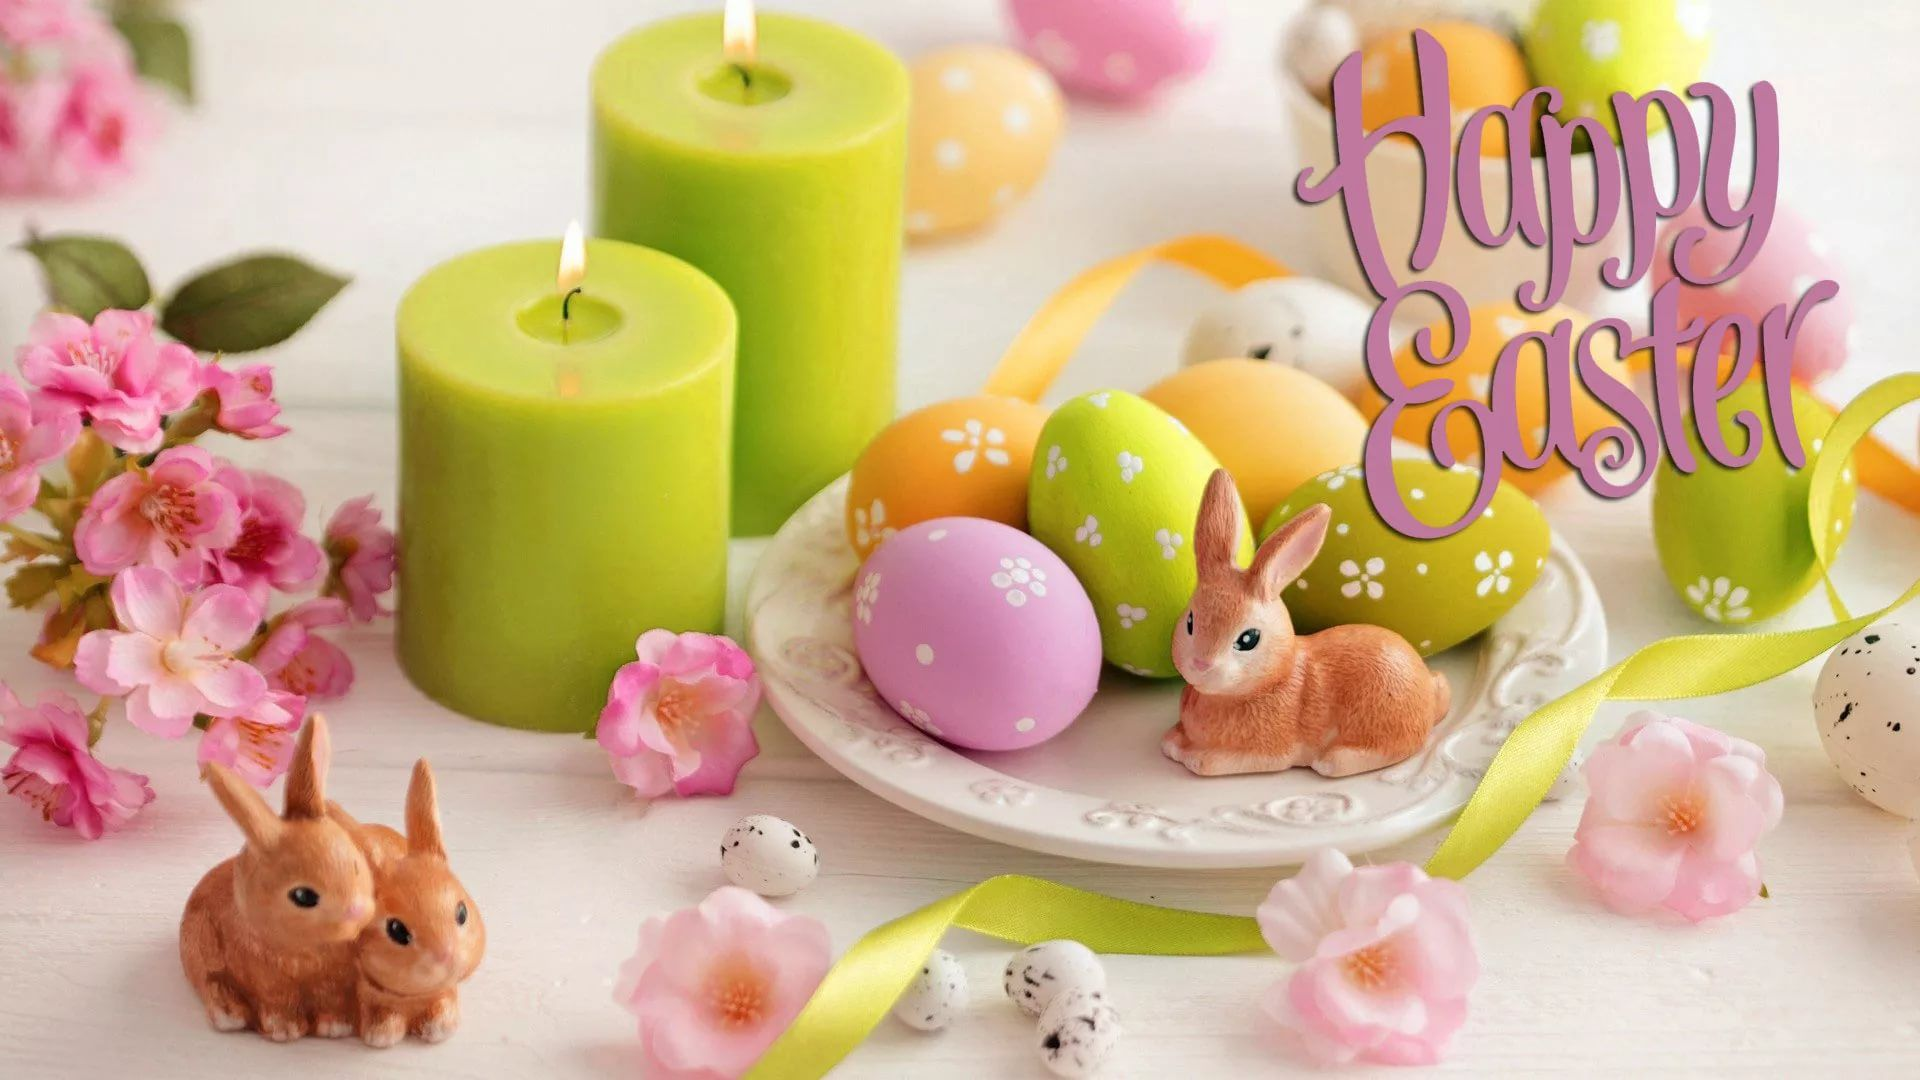 Happy Easter vertical wallpaper hd